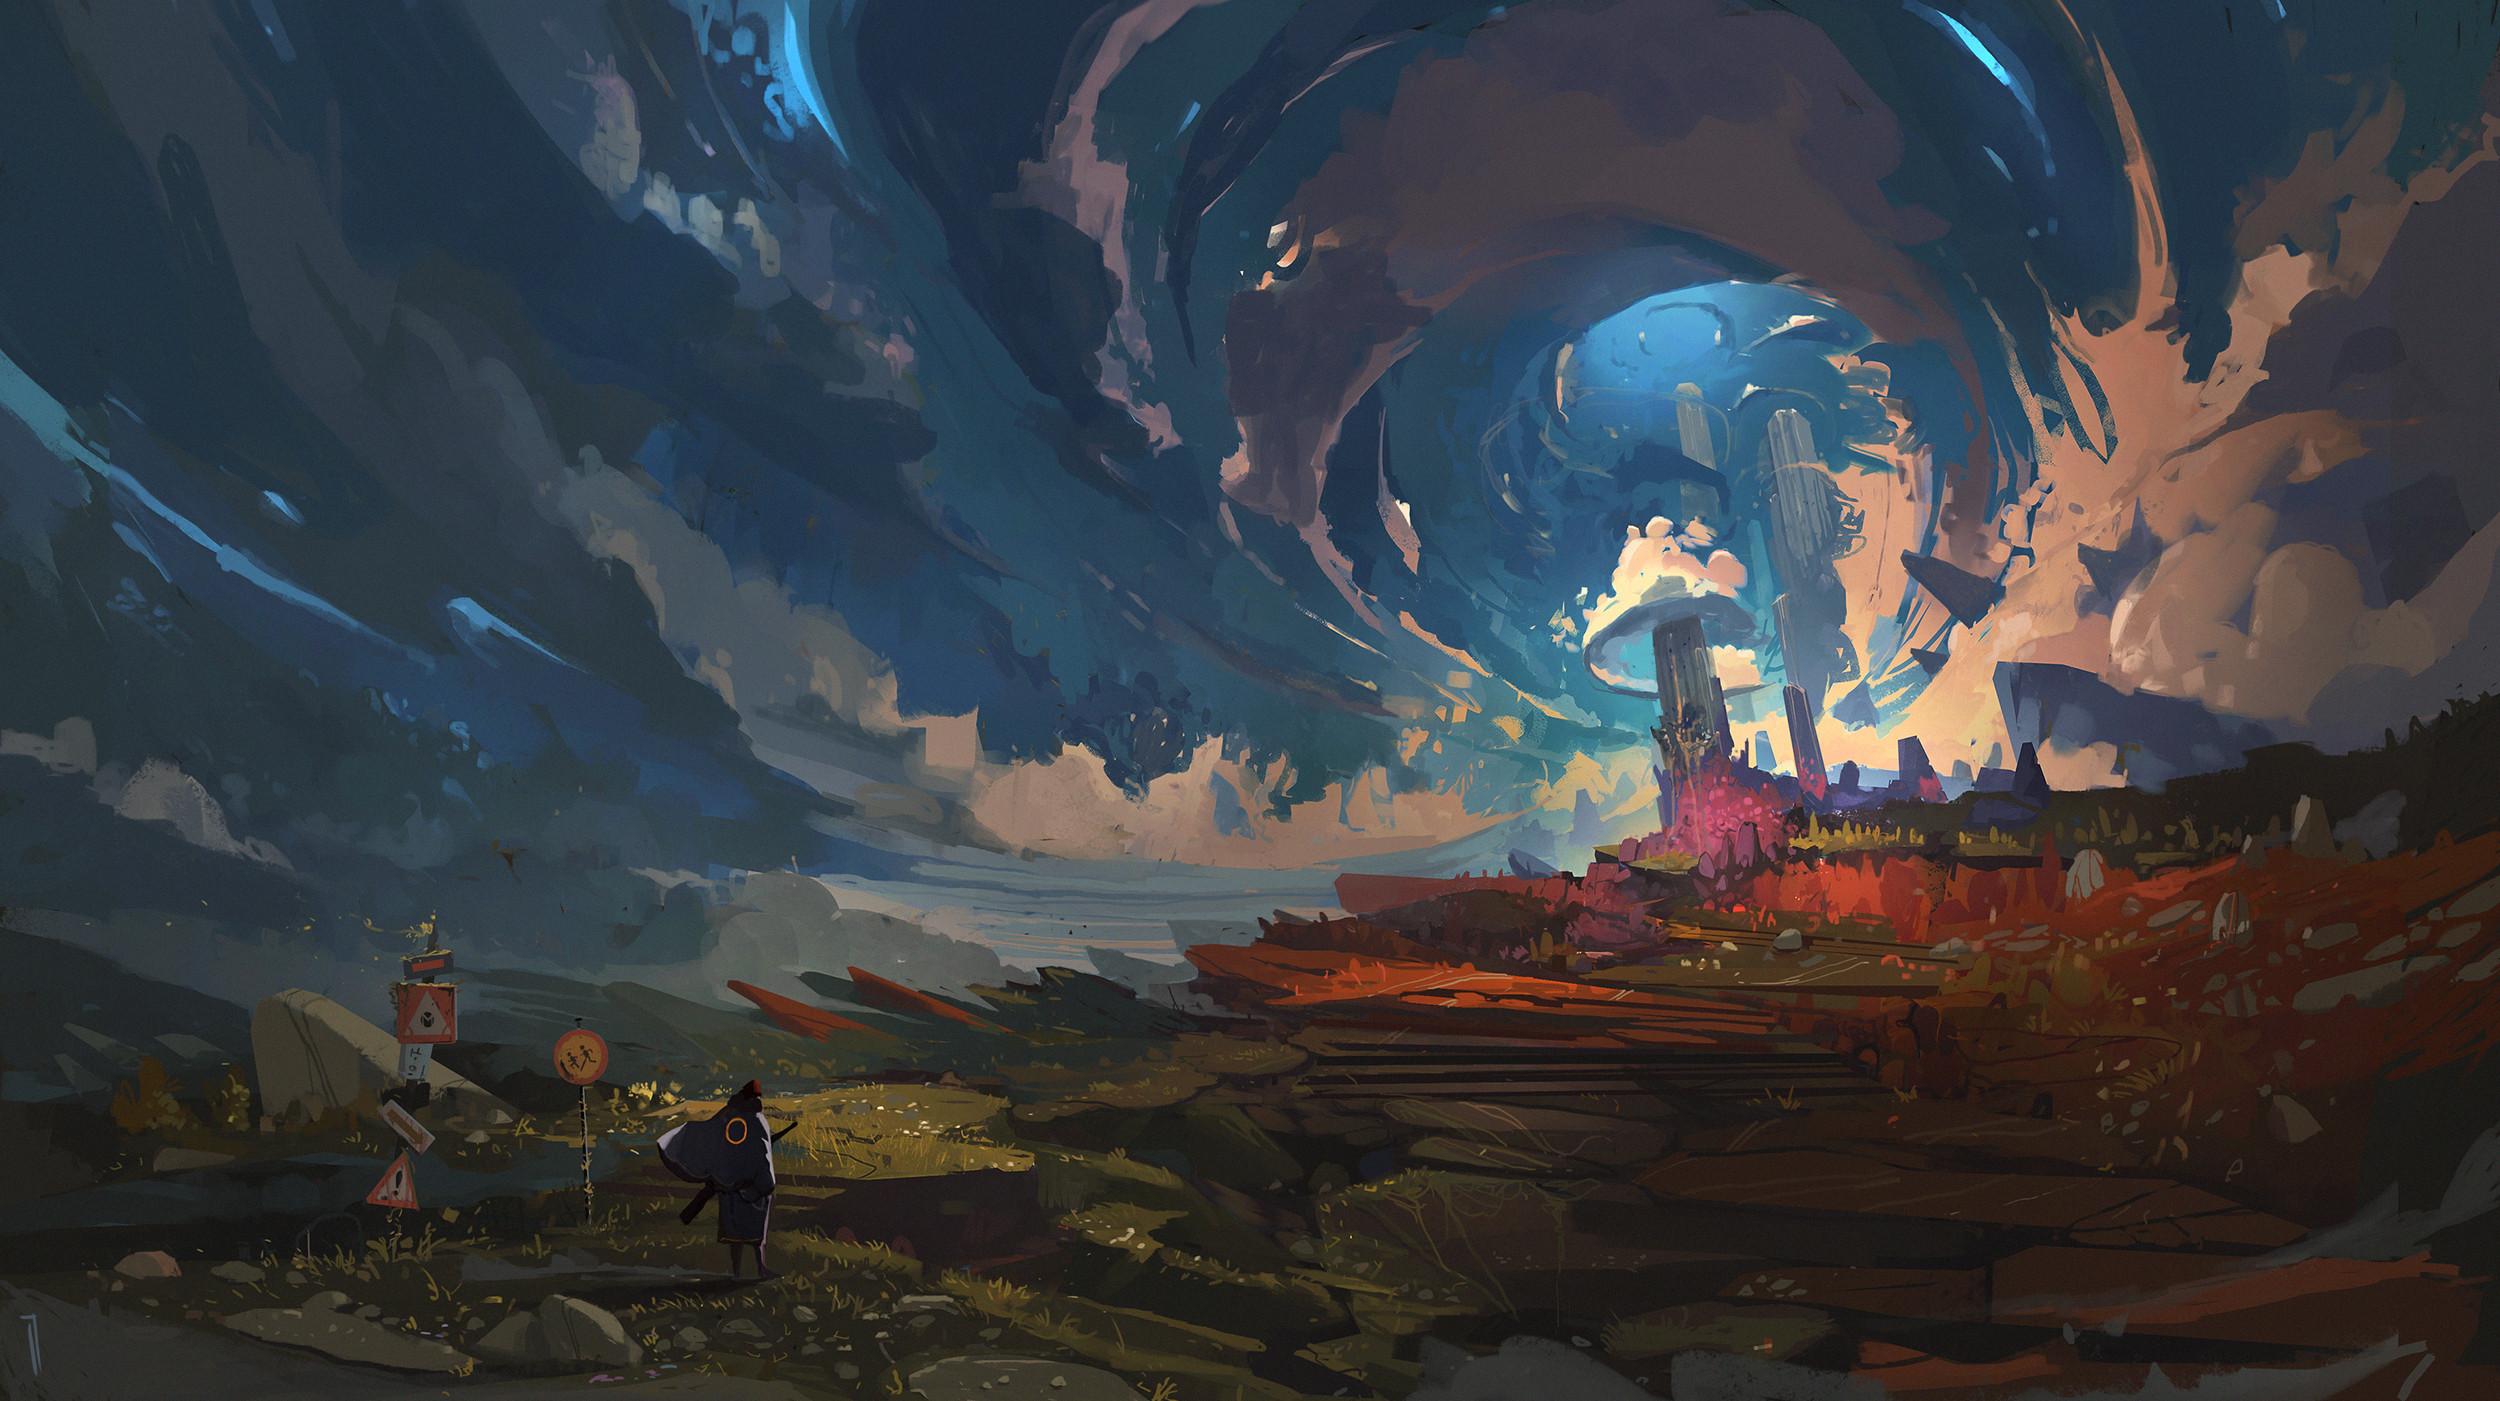 General 2500x1401 Ismail Inceoglu drawing digital art landscape artwork blue light castle ArtStation